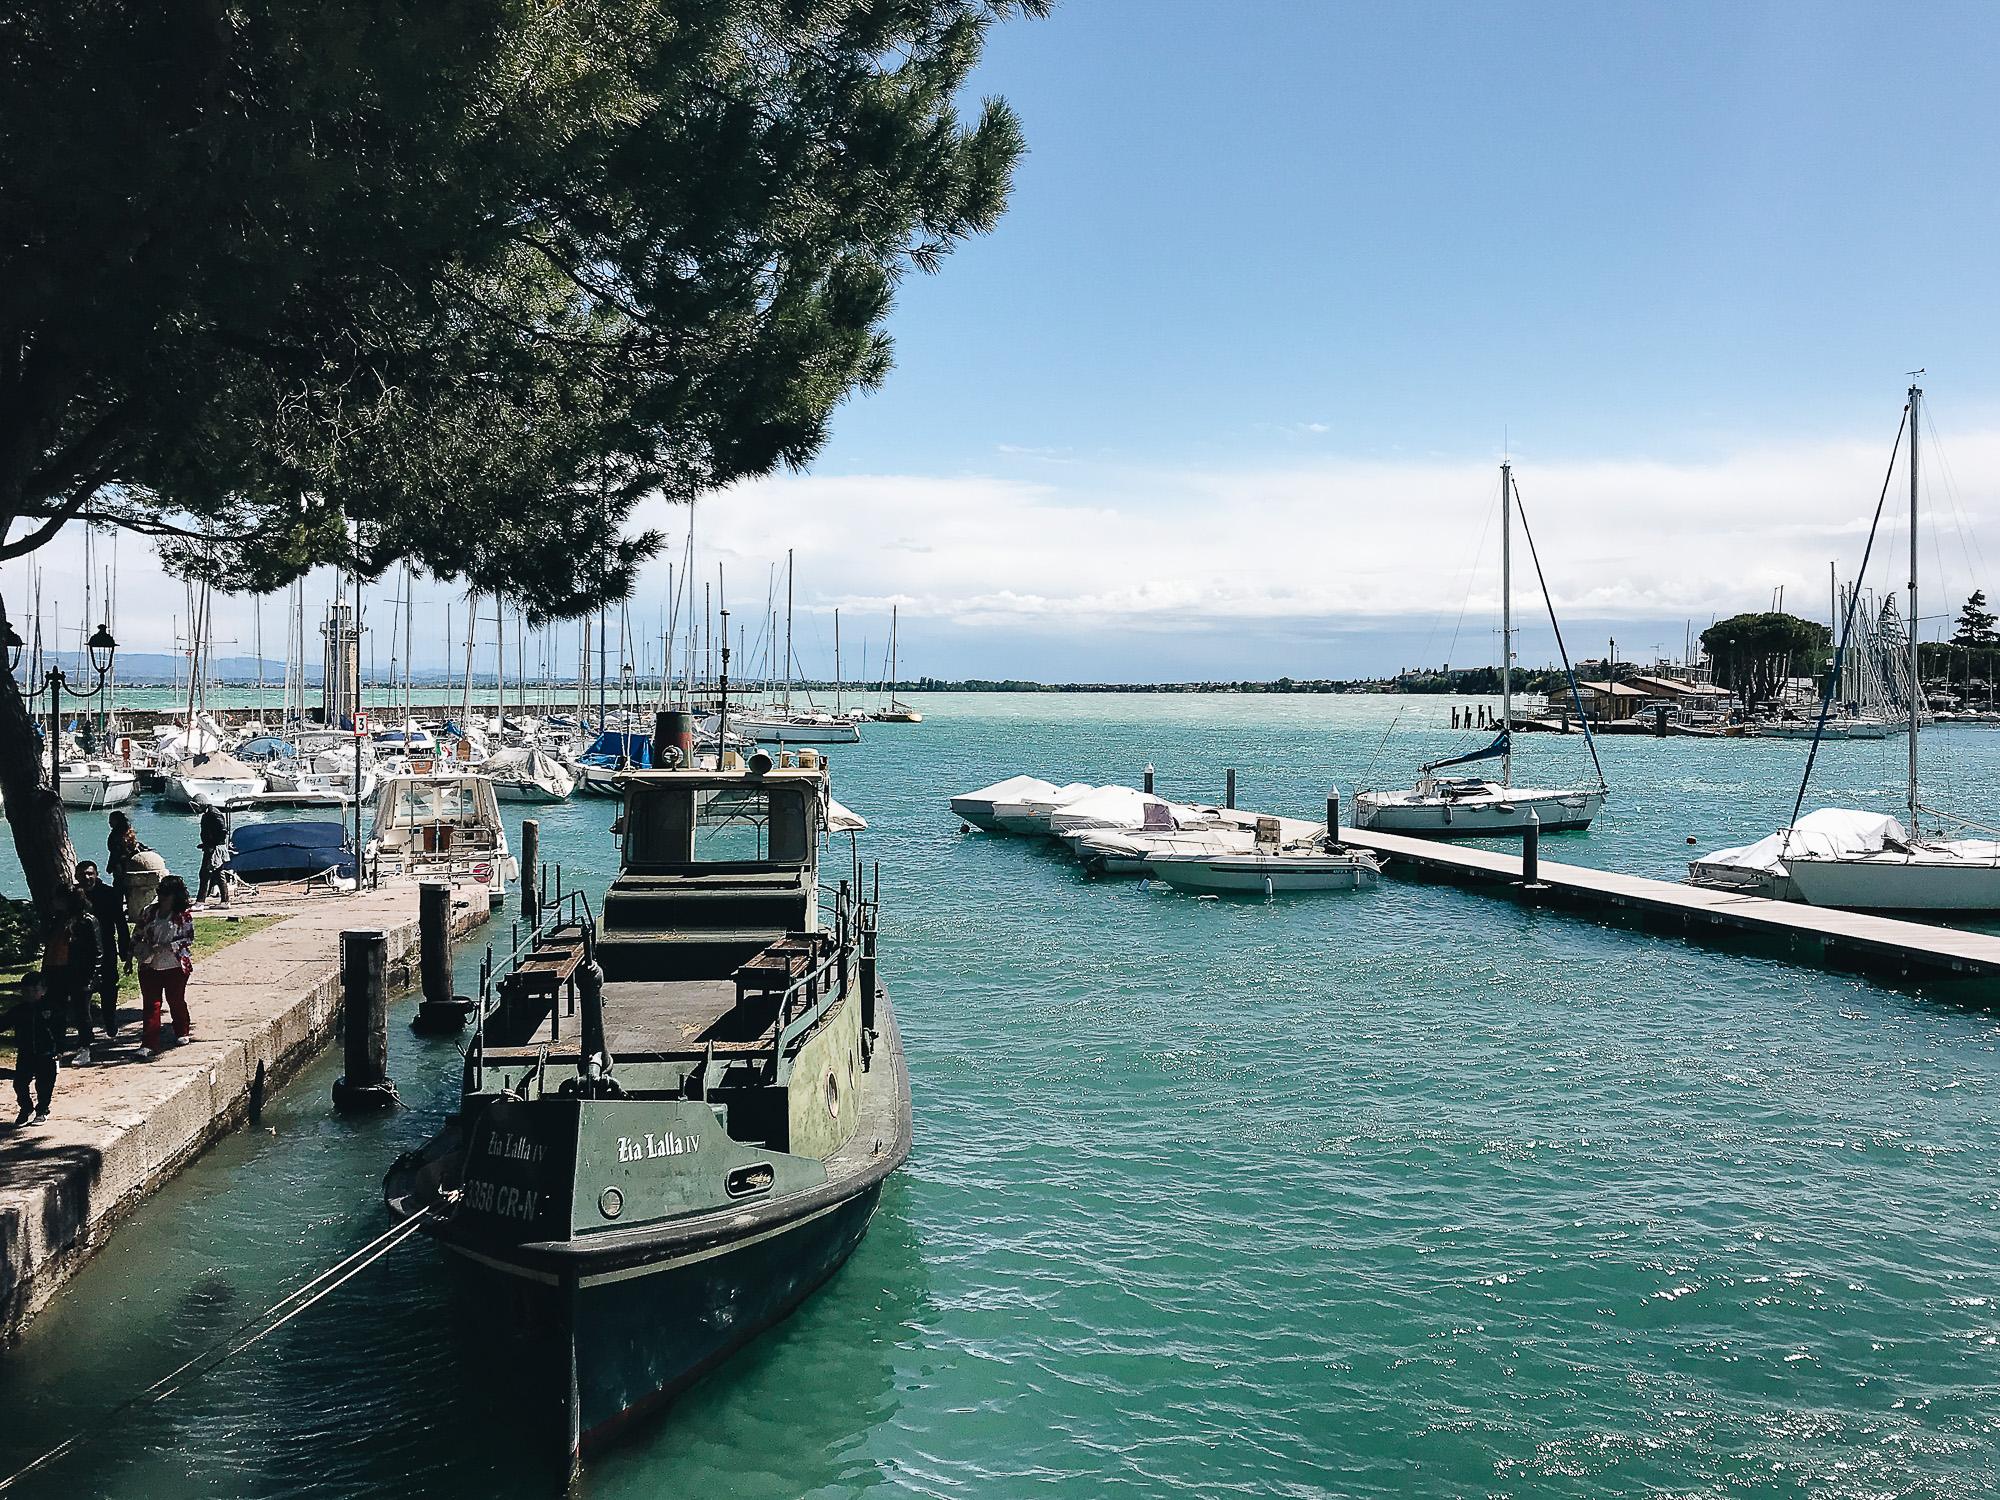 OurBeautifulAdventure-LakeGarda-Italy-Blog-6372.jpg